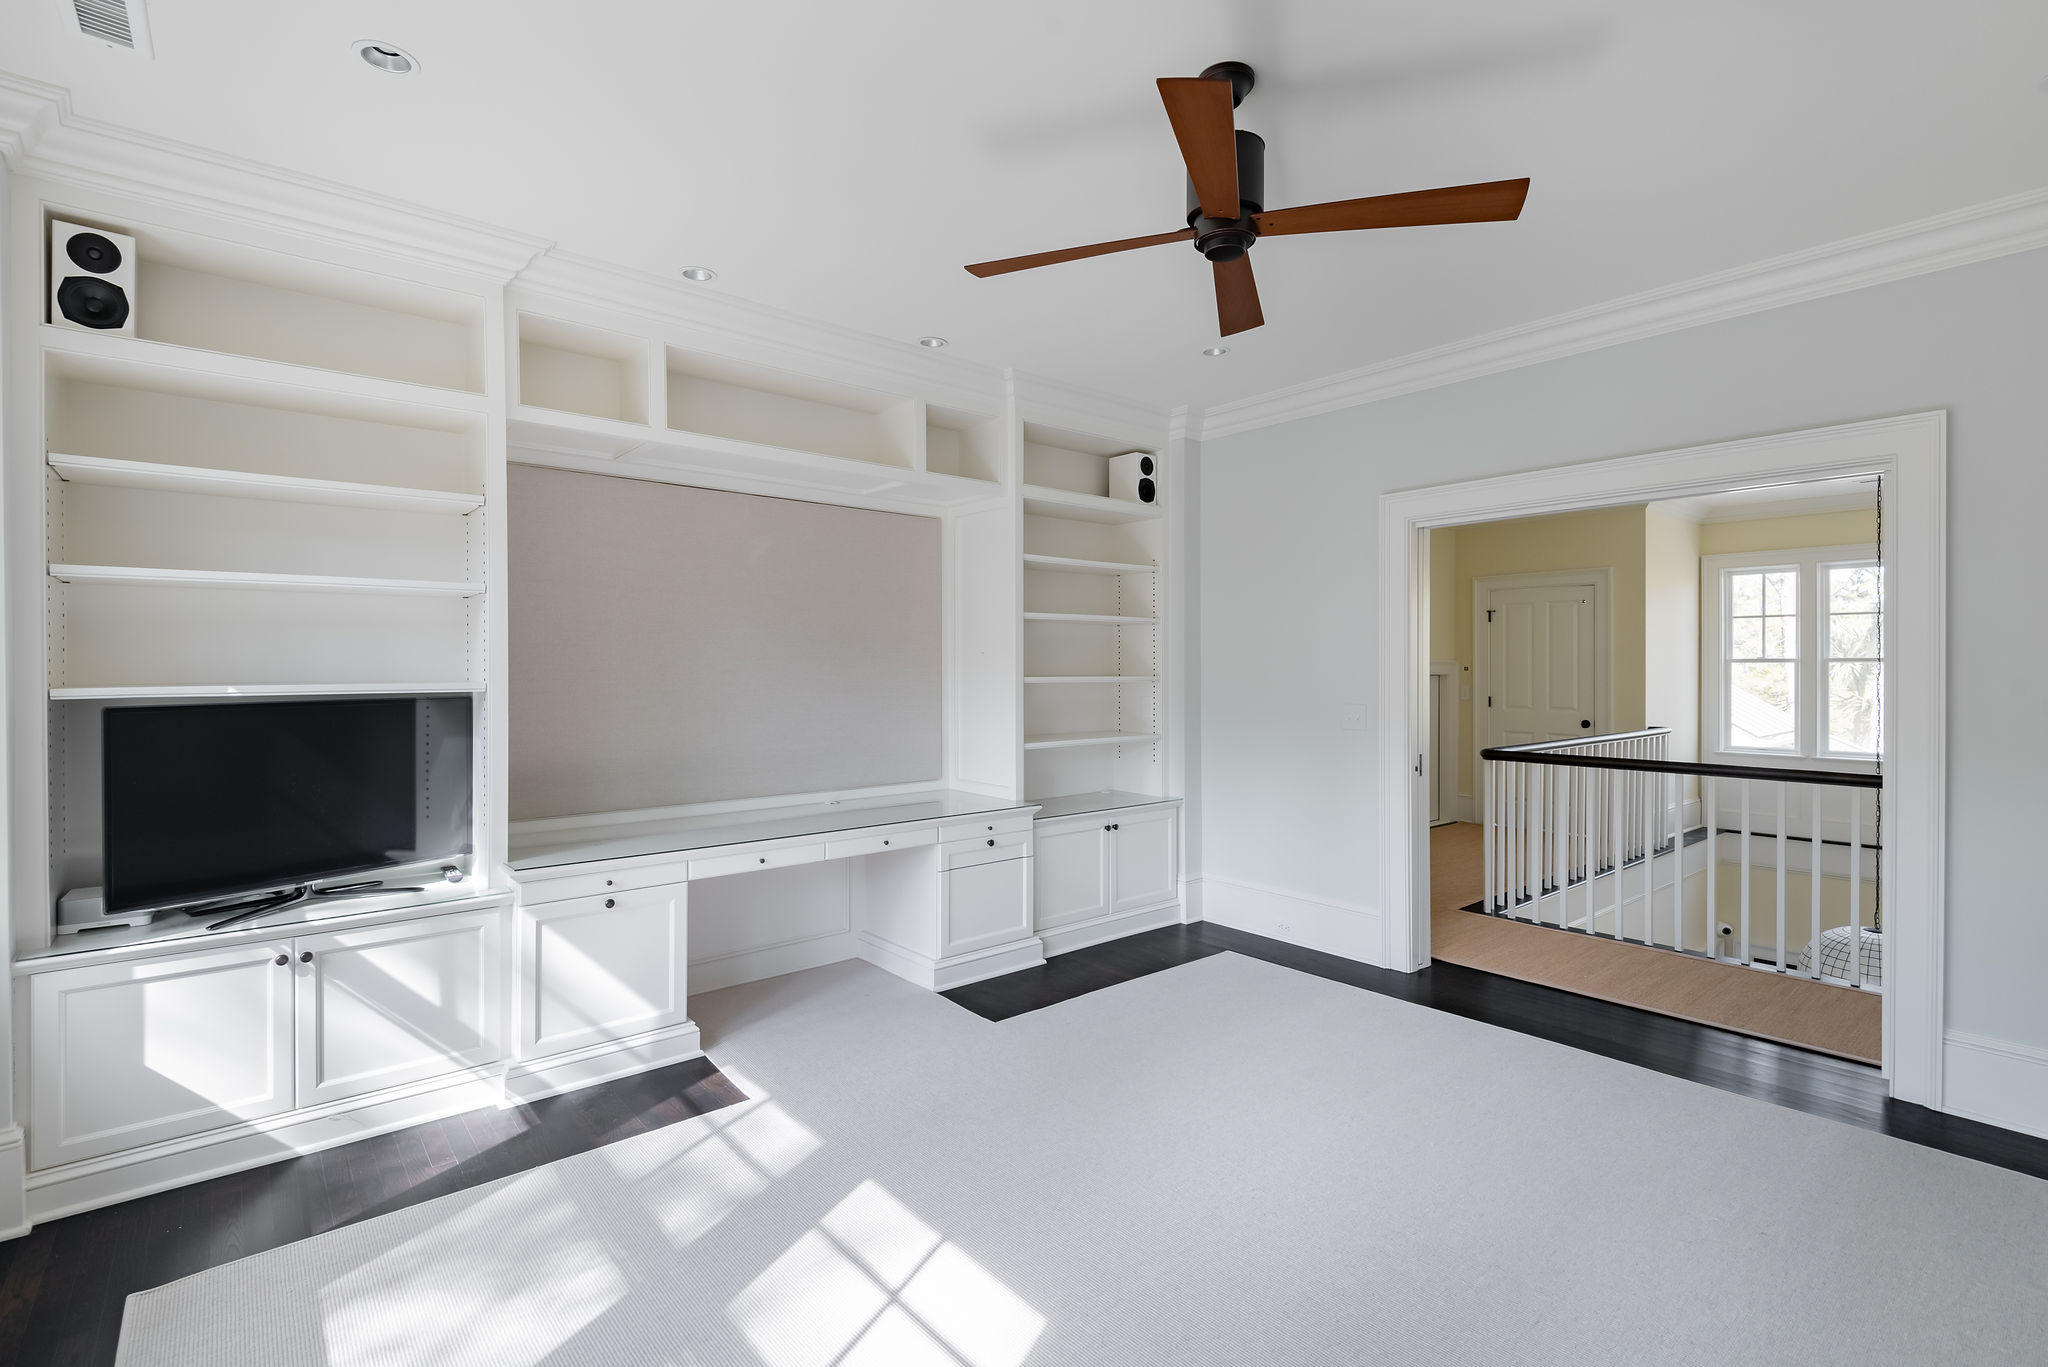 Kiawah Island Homes For Sale - 3 Grey Widgeon, Kiawah Island, SC - 33